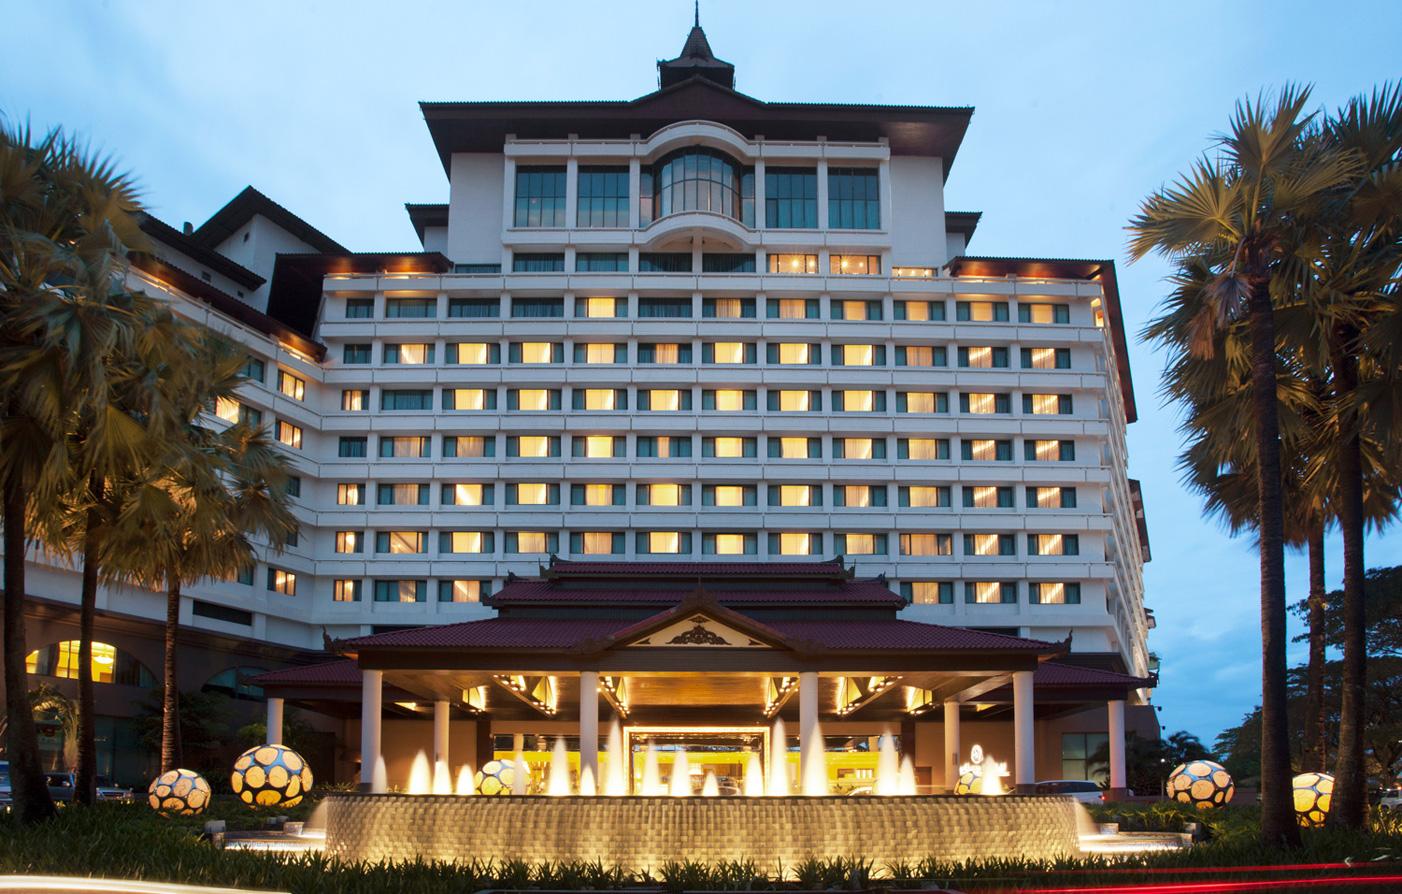 Yangon luxury hotels sedona hotel yangon myanmar hotel for Design hotel yangon